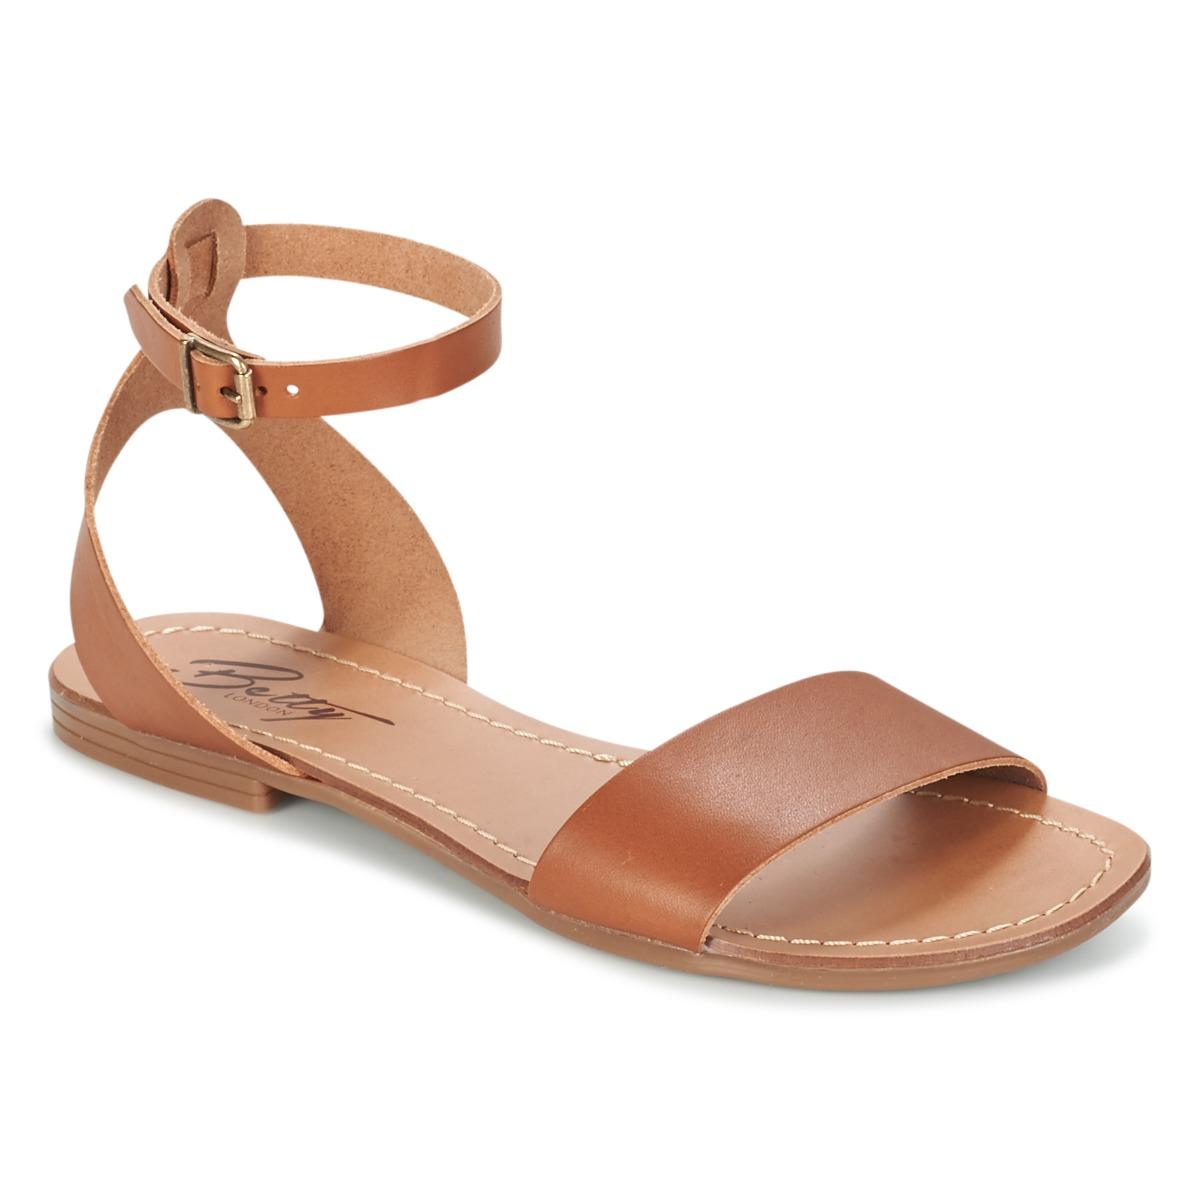 Betty London GIMY Camel - Kostenloser Versand bei Spartoode ! - Schuhe Sandalen / Sandaletten Damen 33,99 €